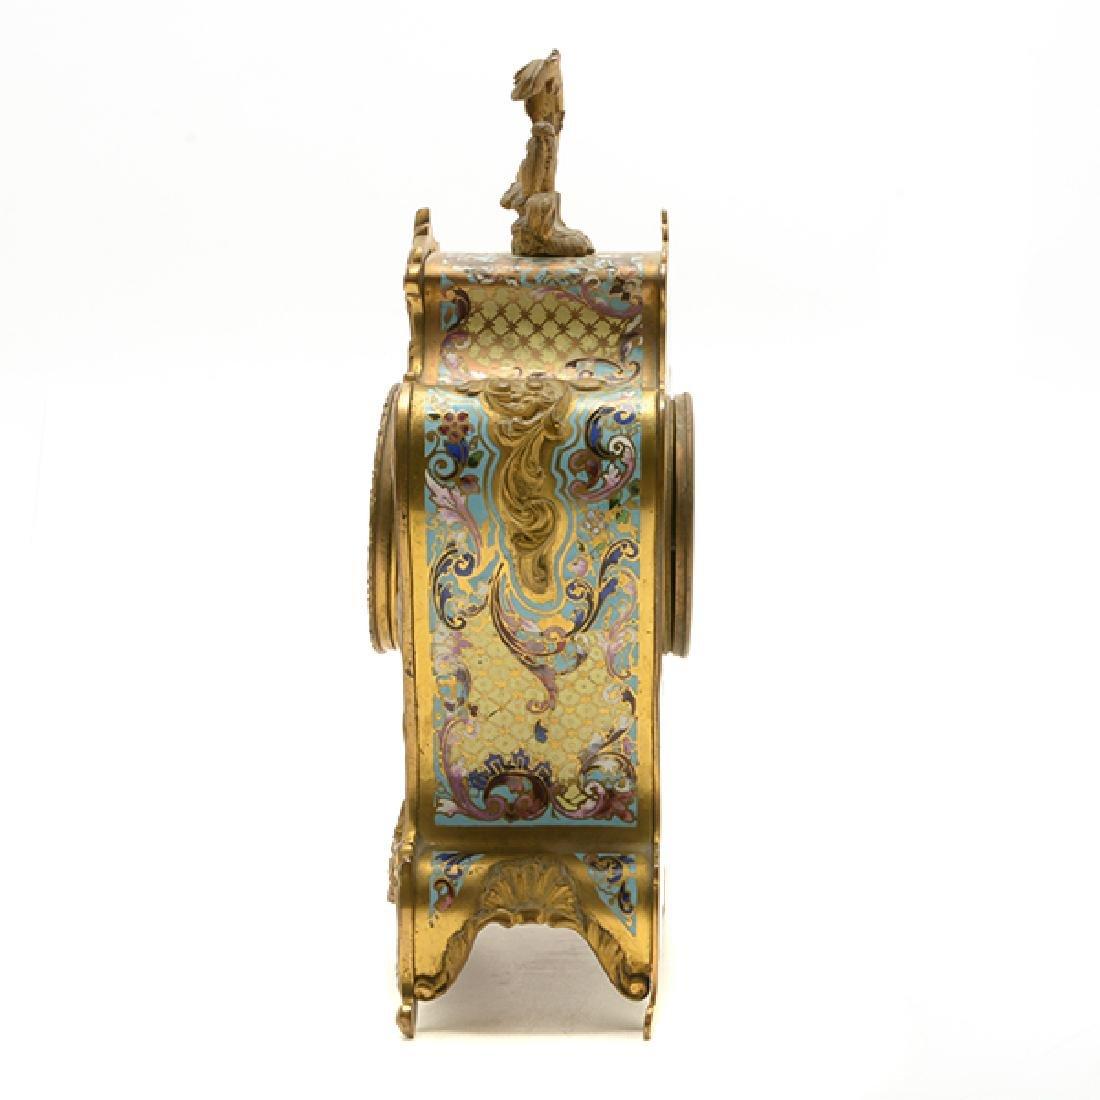 Louis XV Gilt Bronze Champleve Enamel Mantel Clock - 2